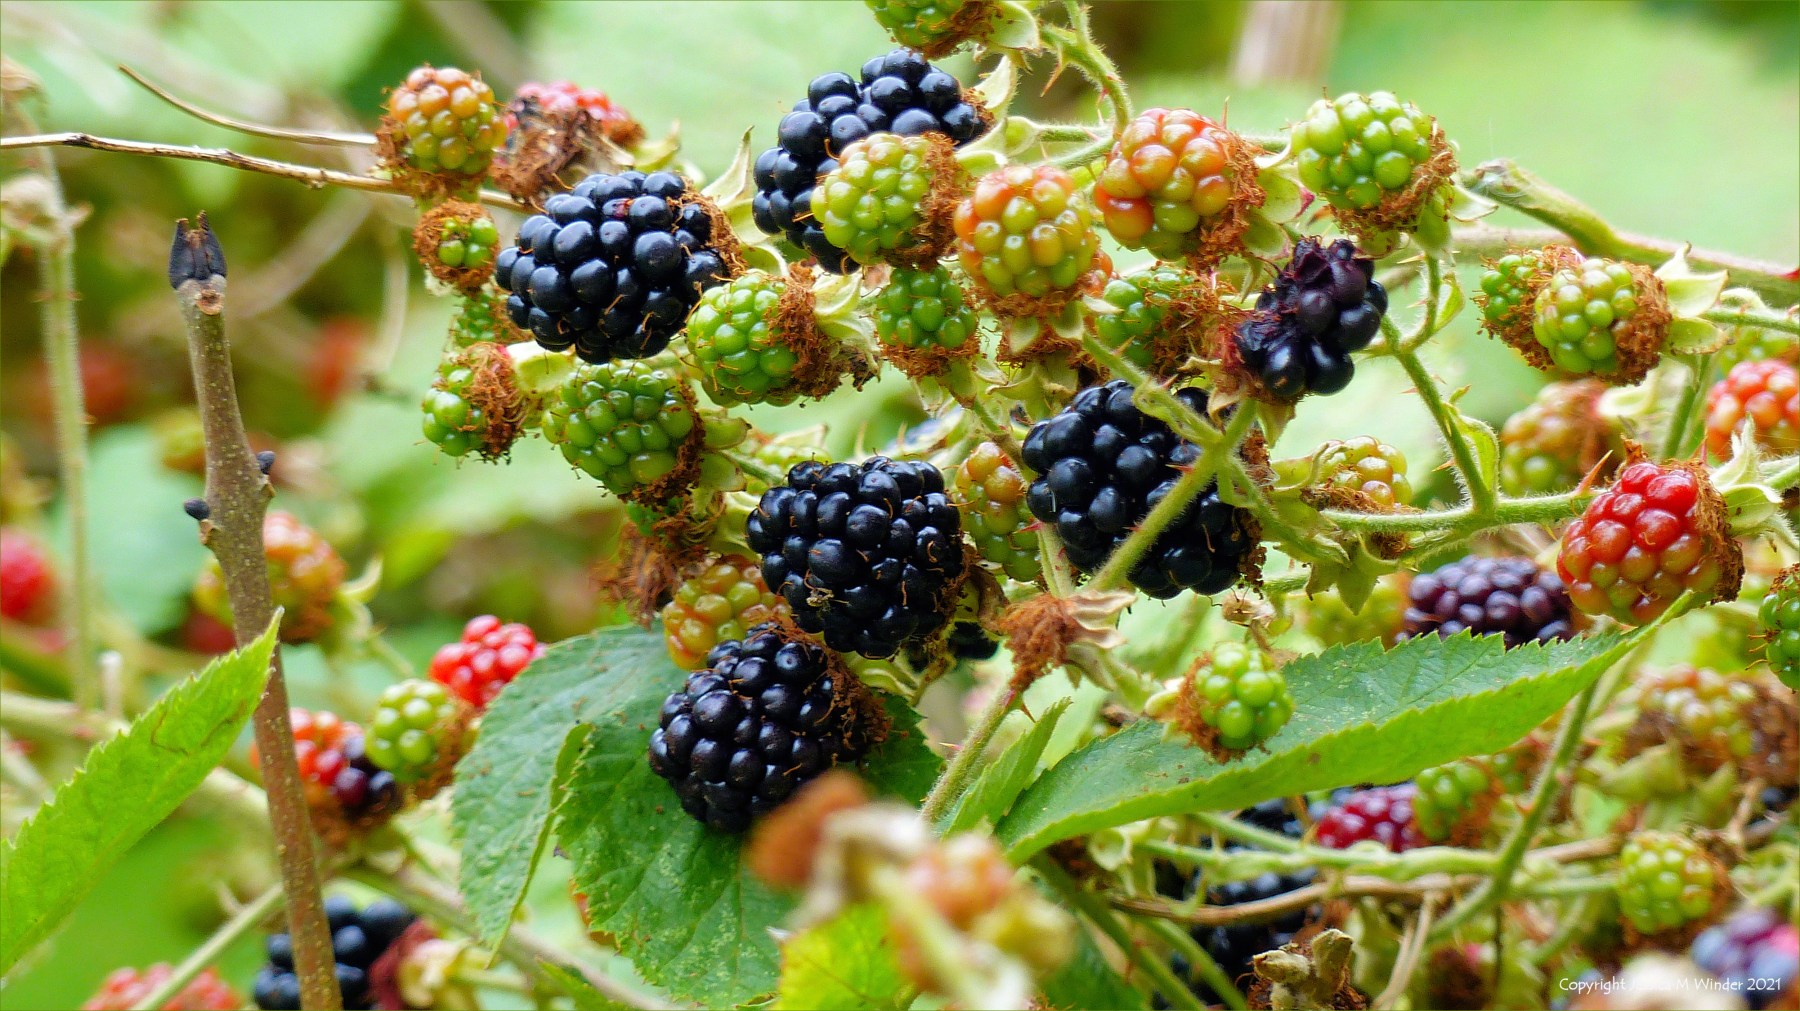 Blackberries beginning to ripen in a hedgerow